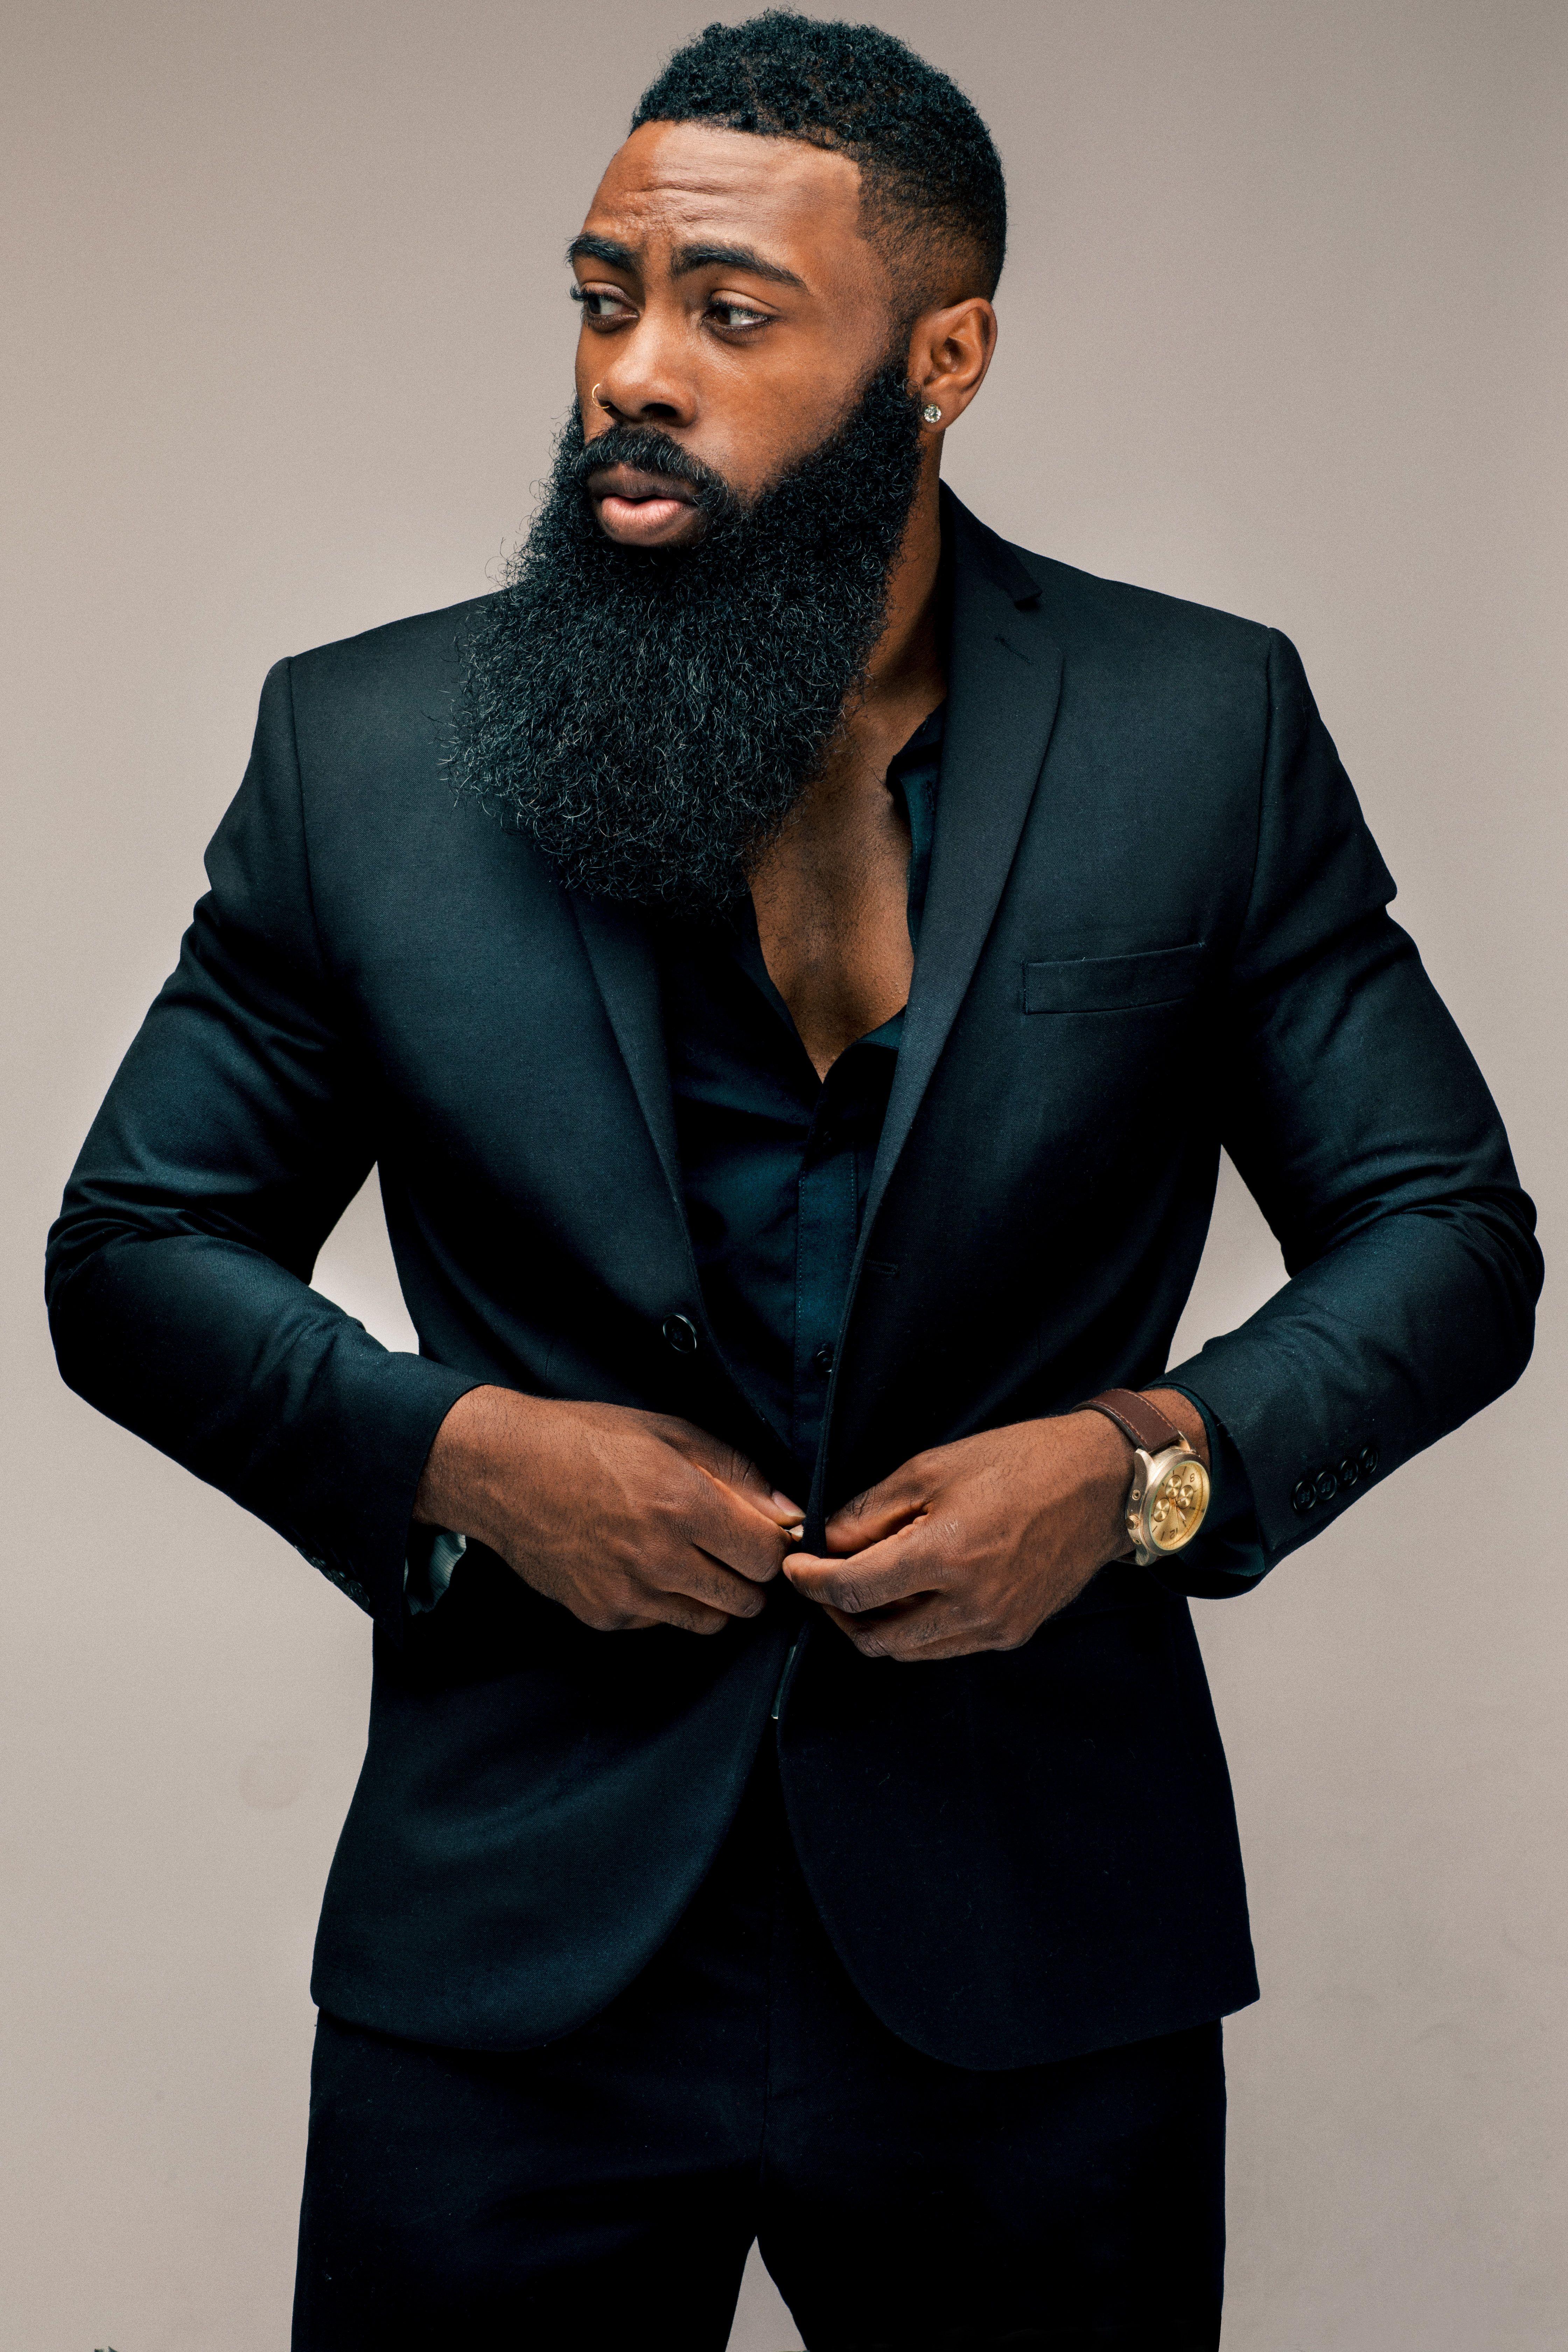 Mcm Omar Parkman In 2019  Sexy Men  Black Men Beards -3292